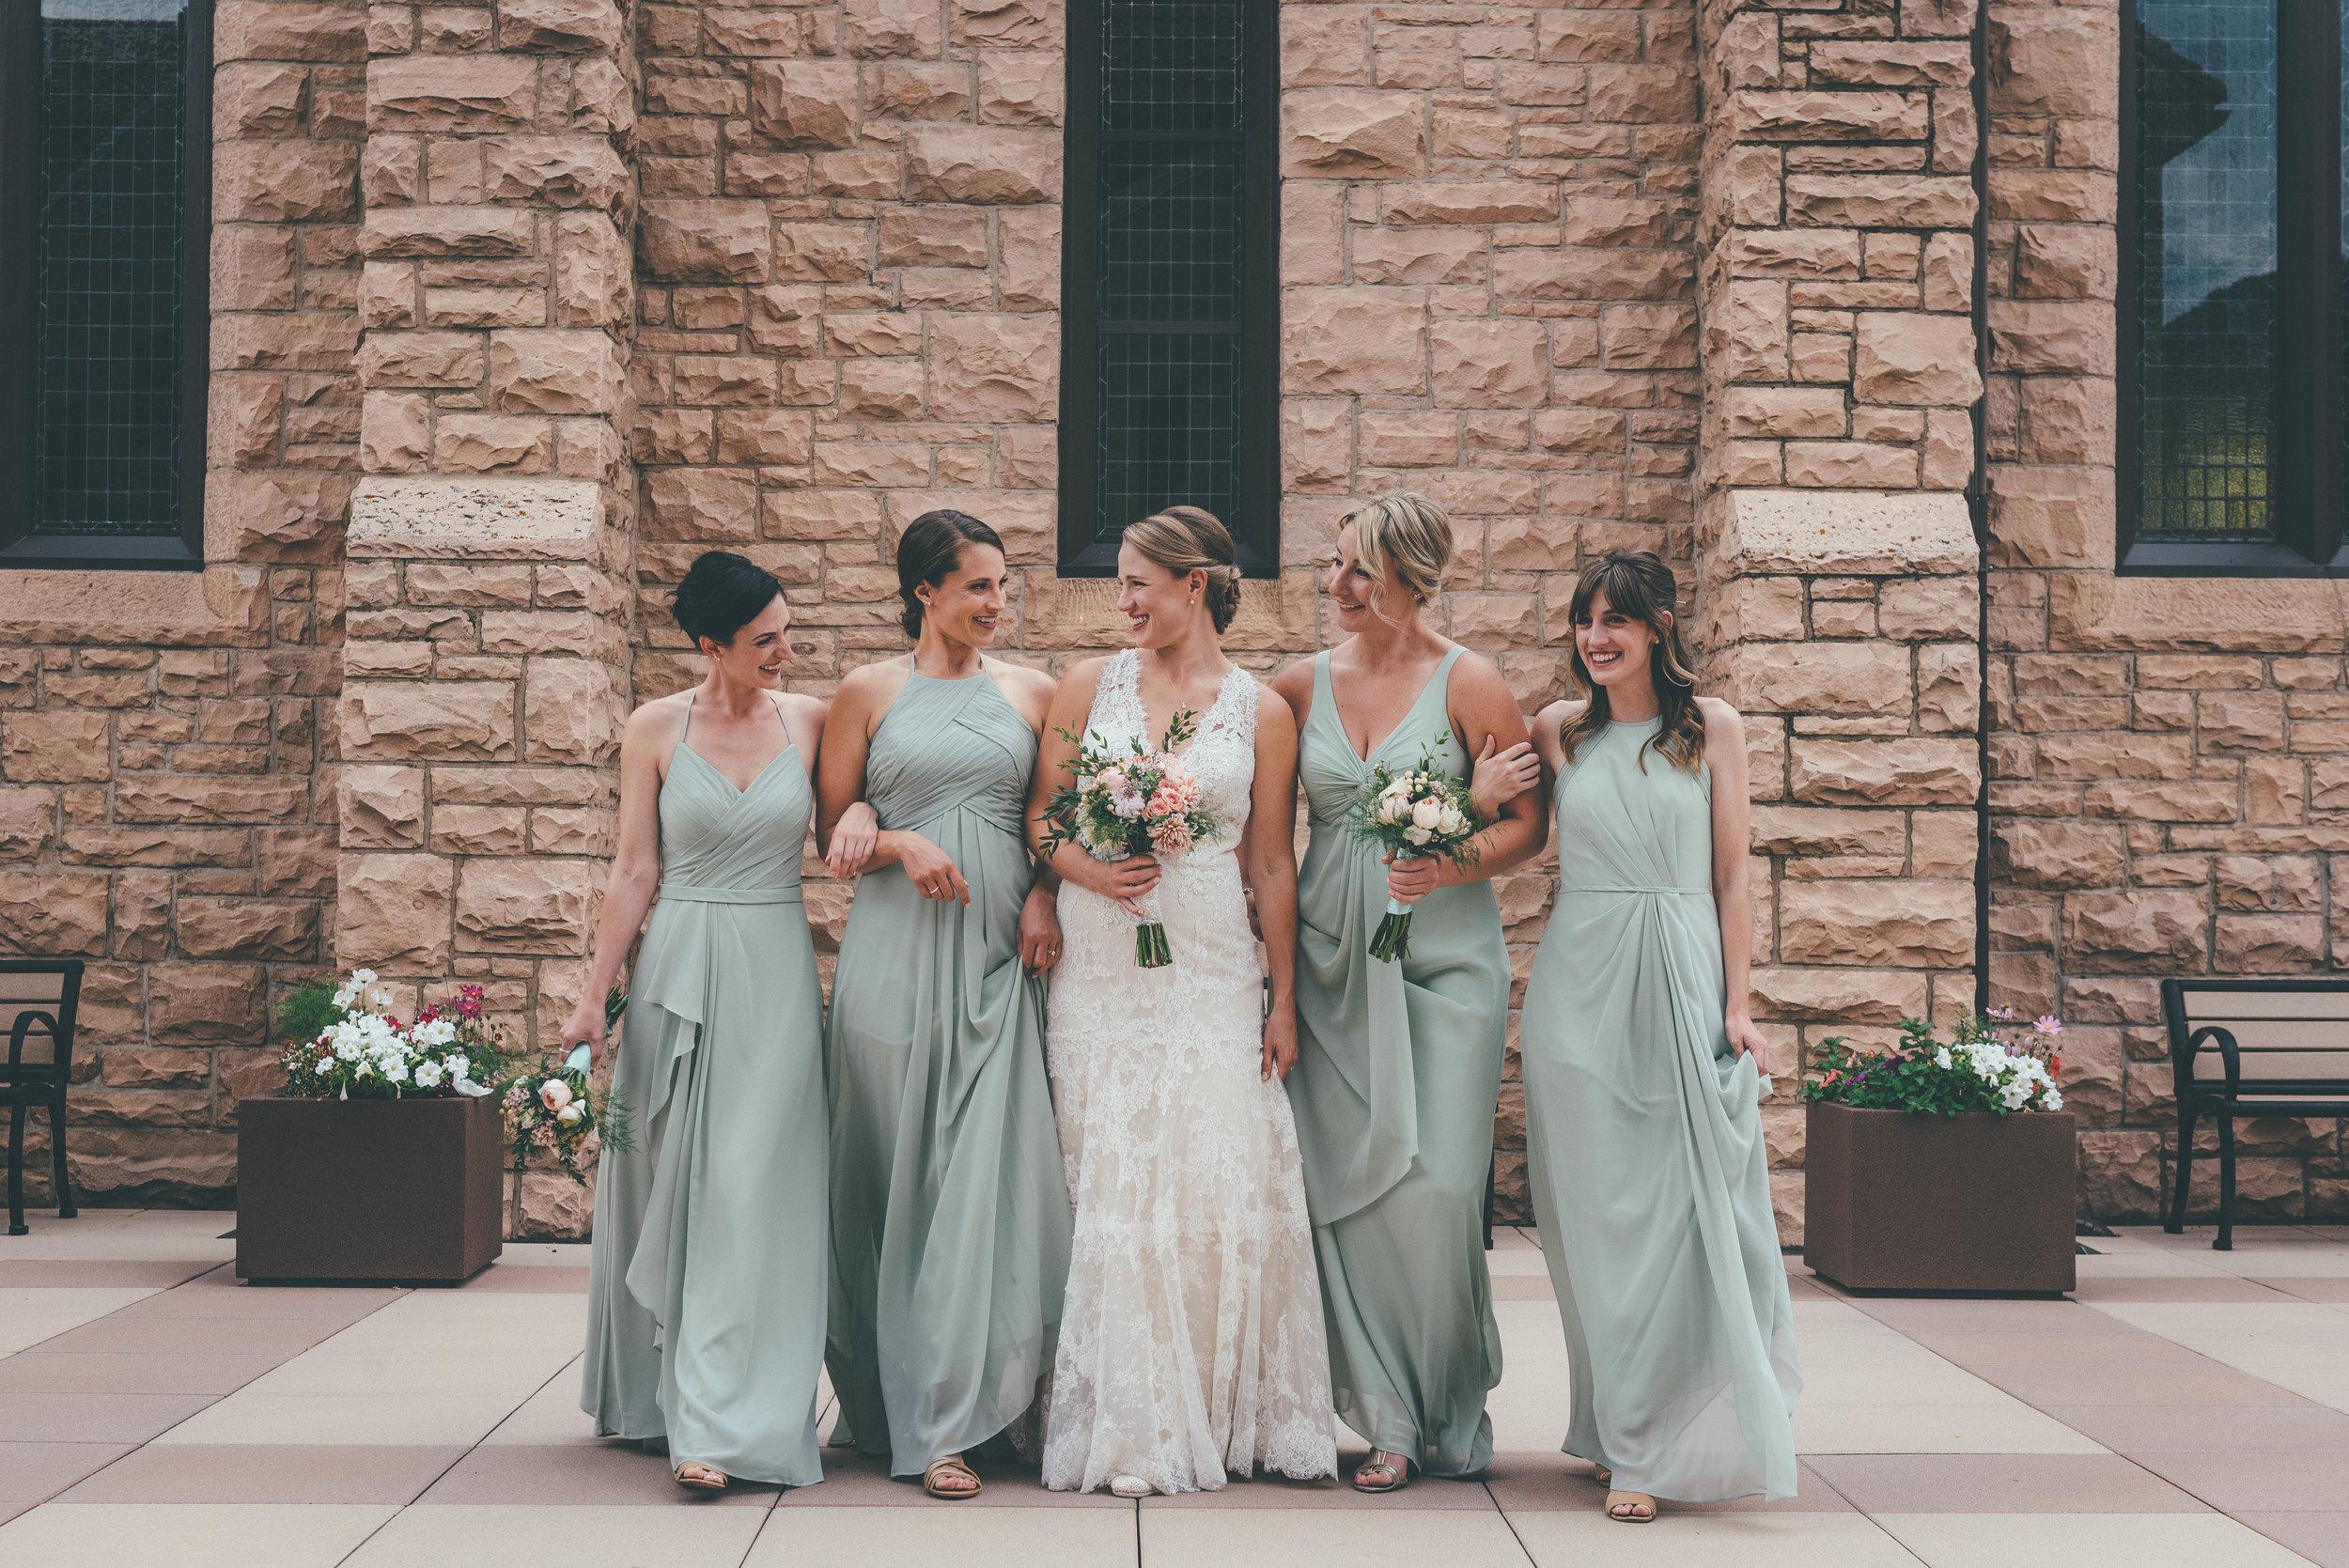 ChadFahnestockPhotography-mc-wedding-007.jpg